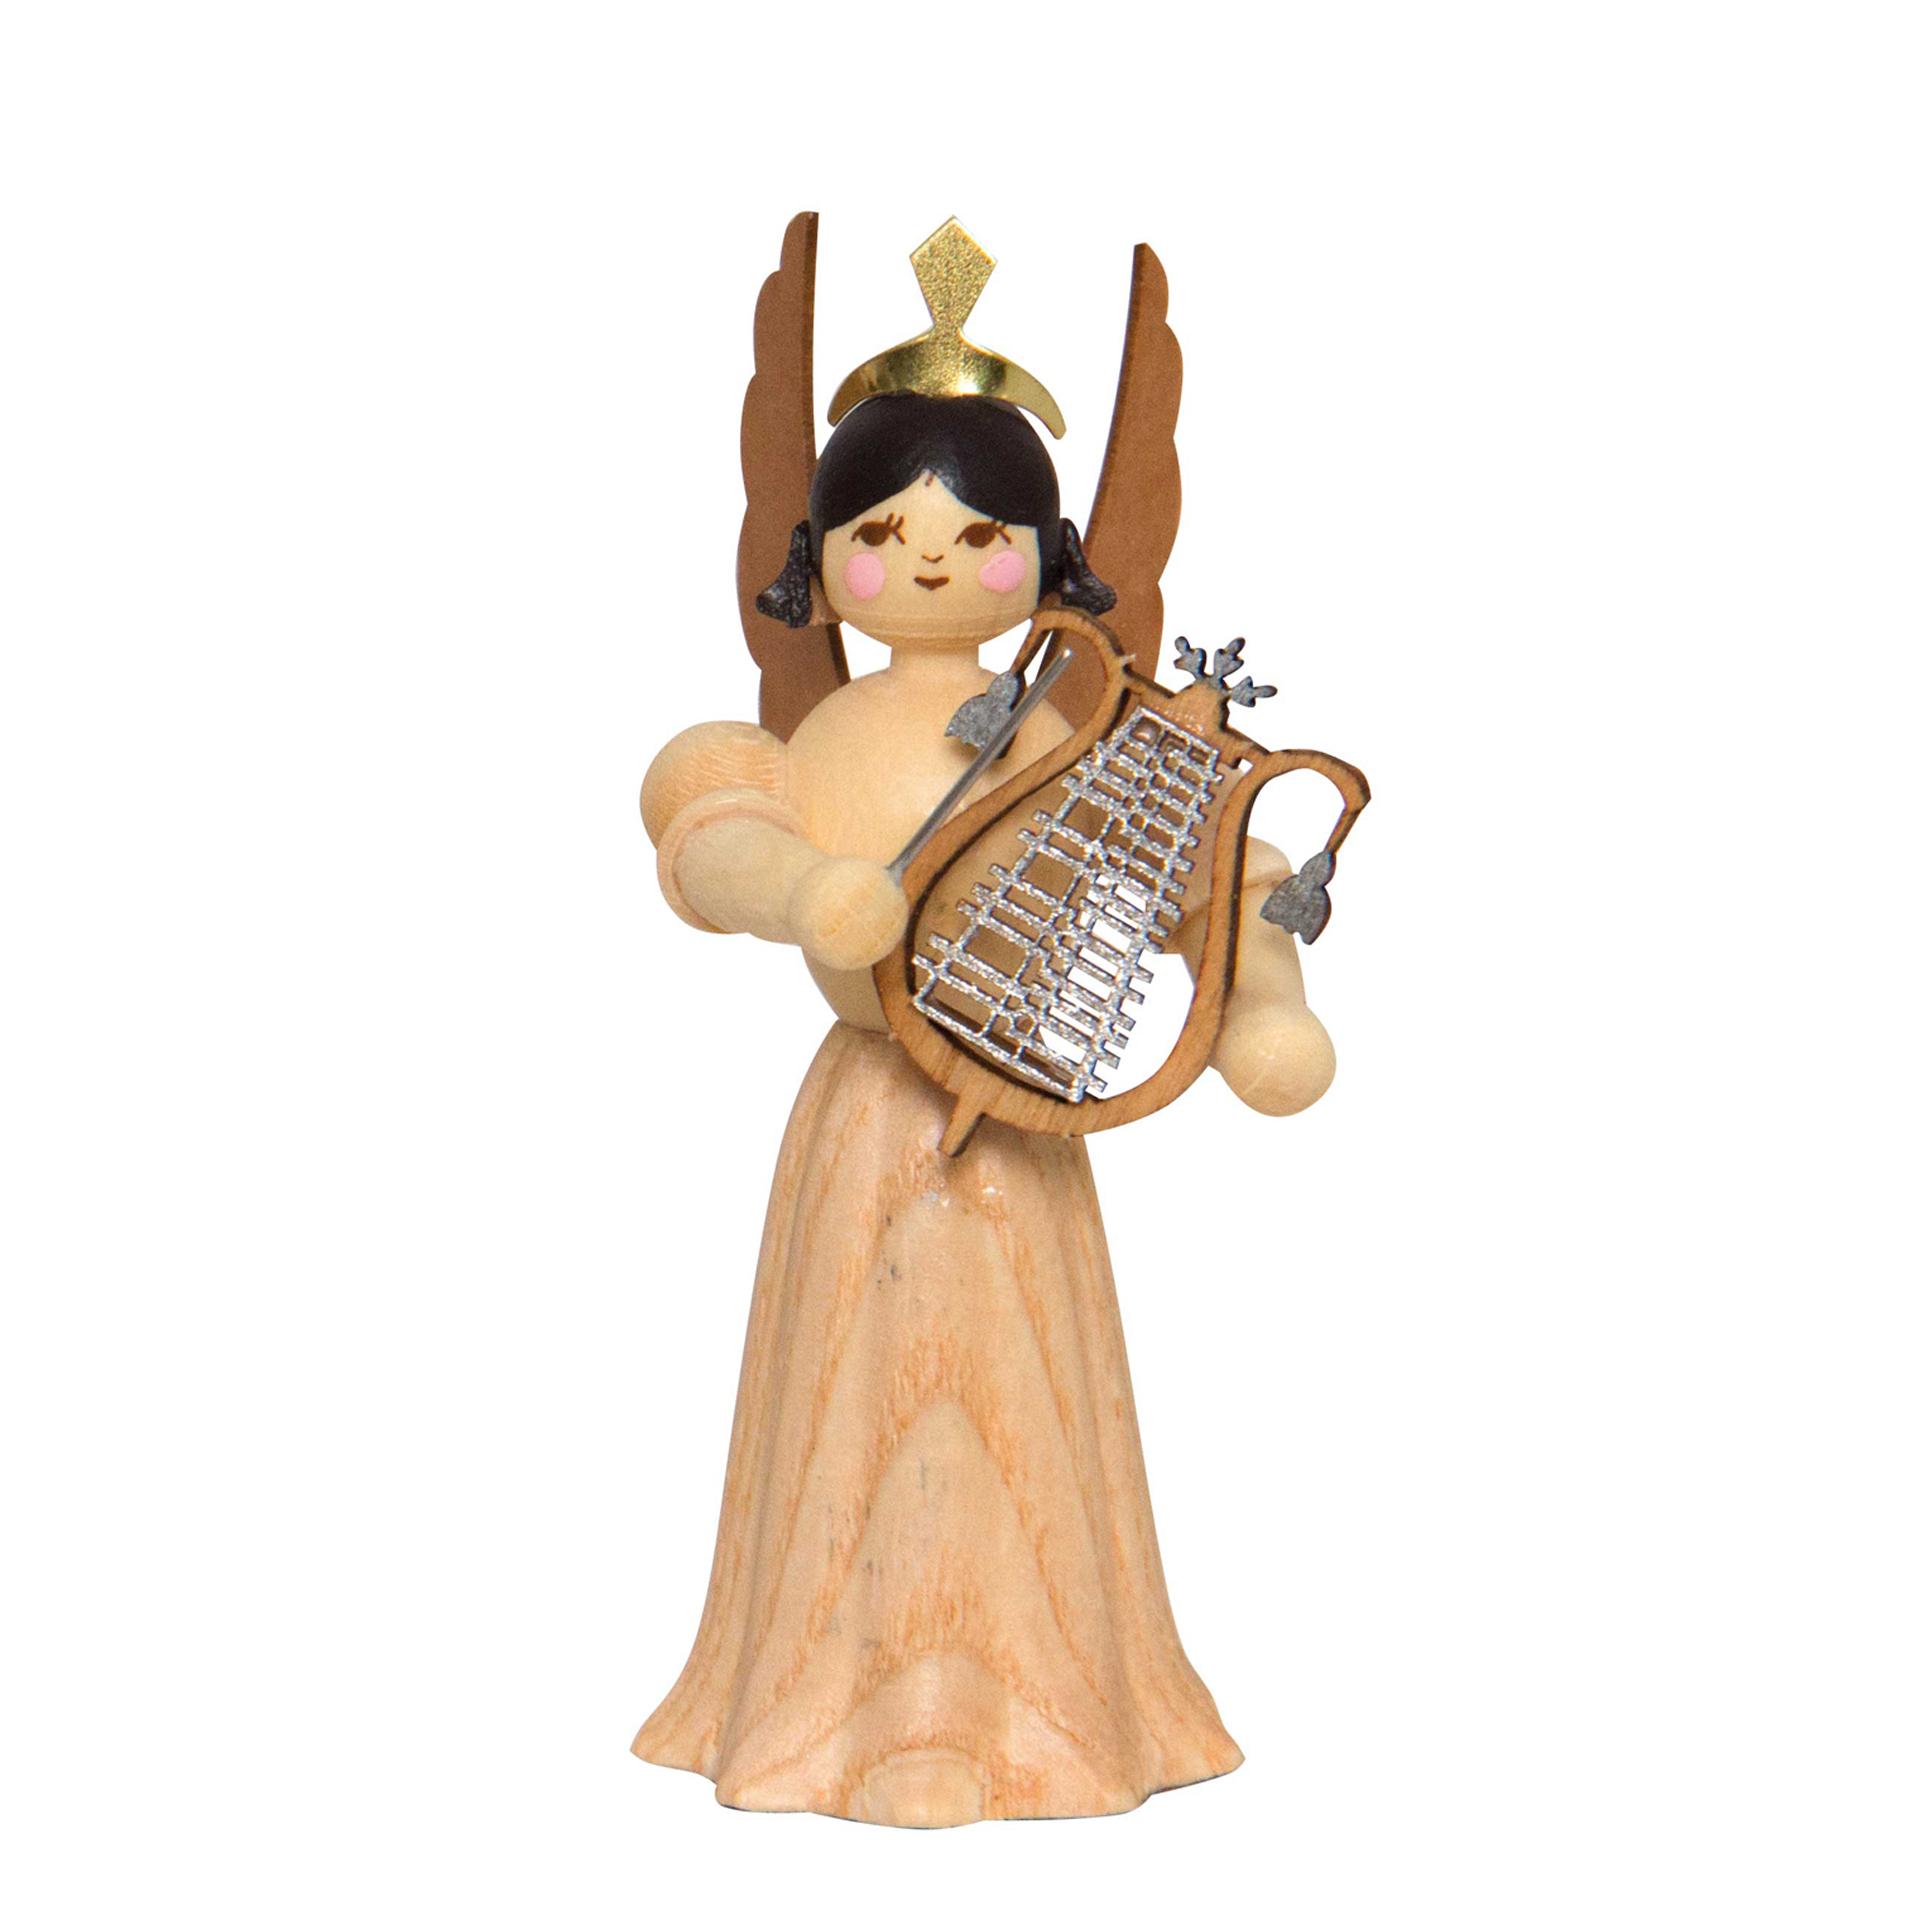 Engel mit großer Lyra, 7cm